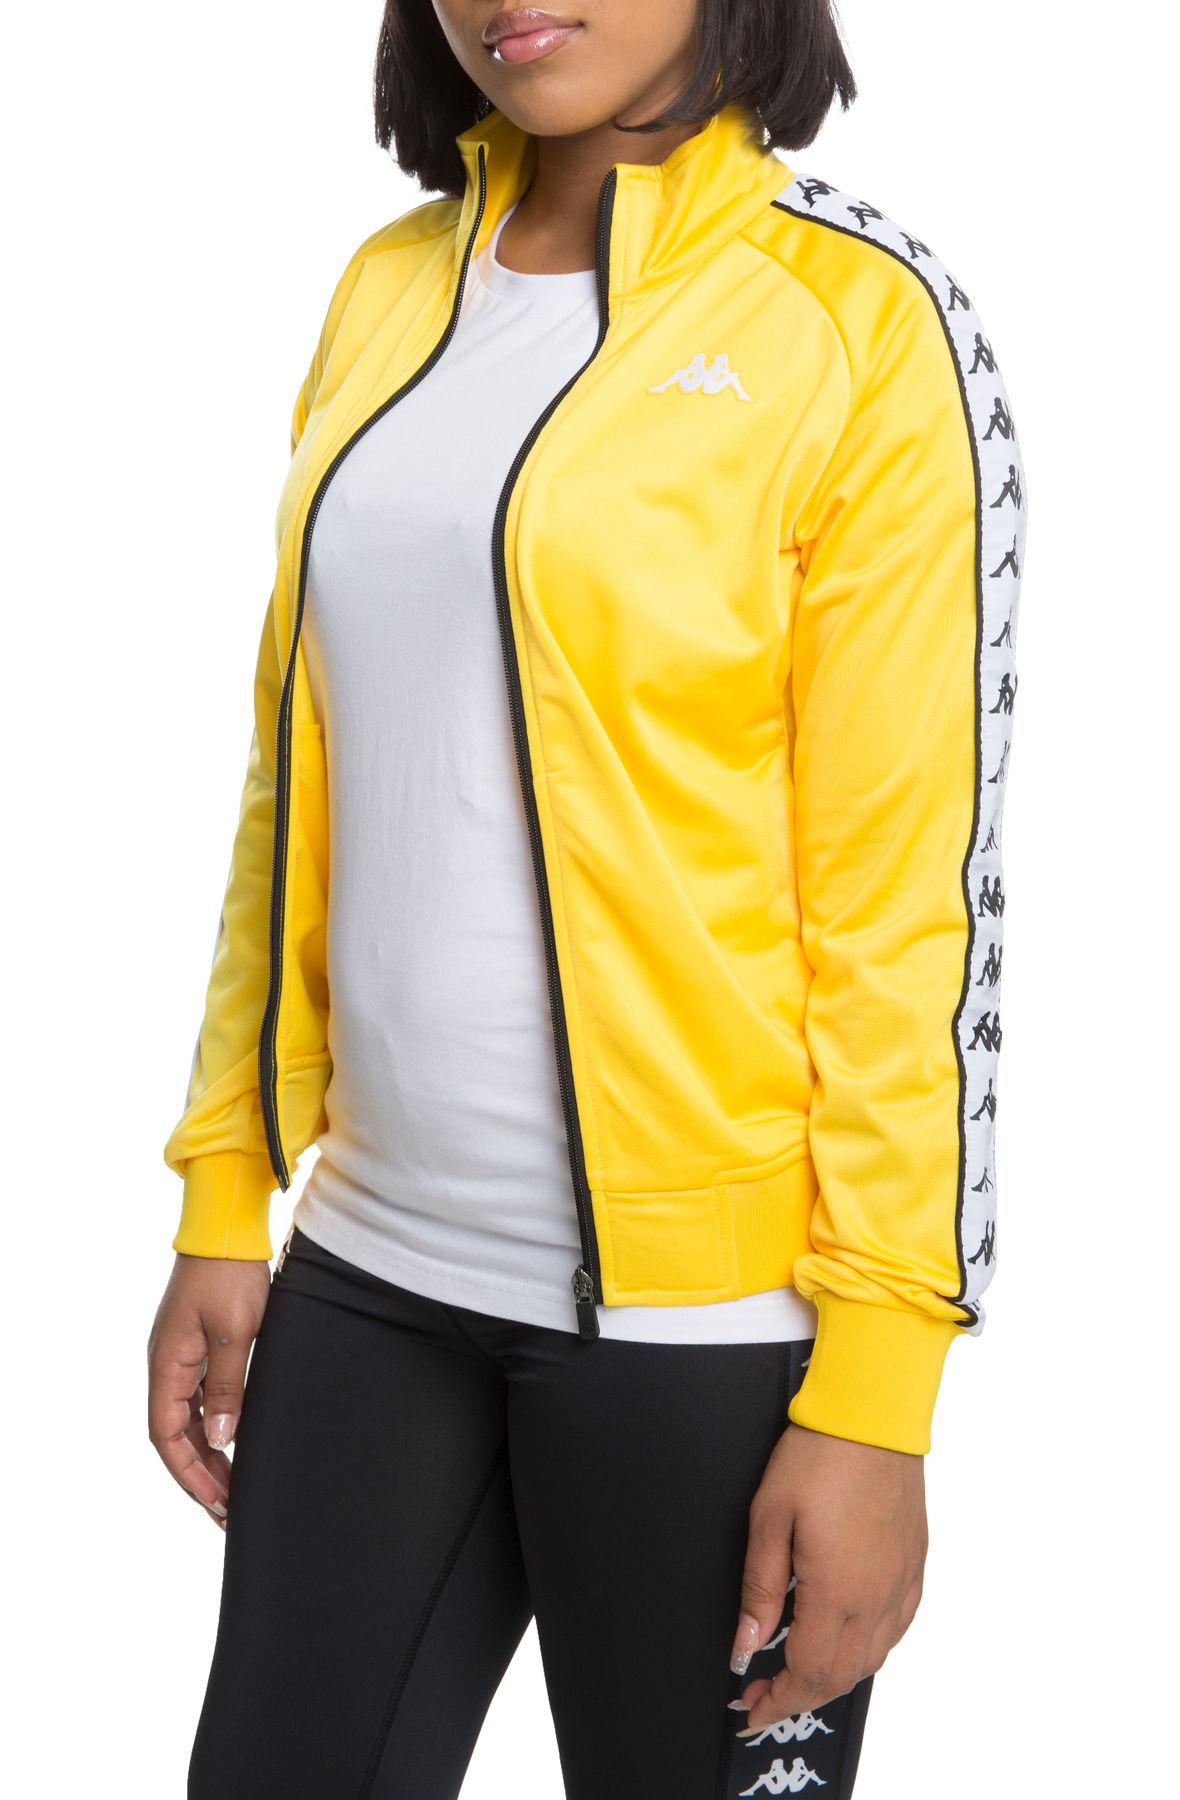 7e77d199a6 222 Banda Wanniston Slim Alternating Banda Track Jacket in Yellow